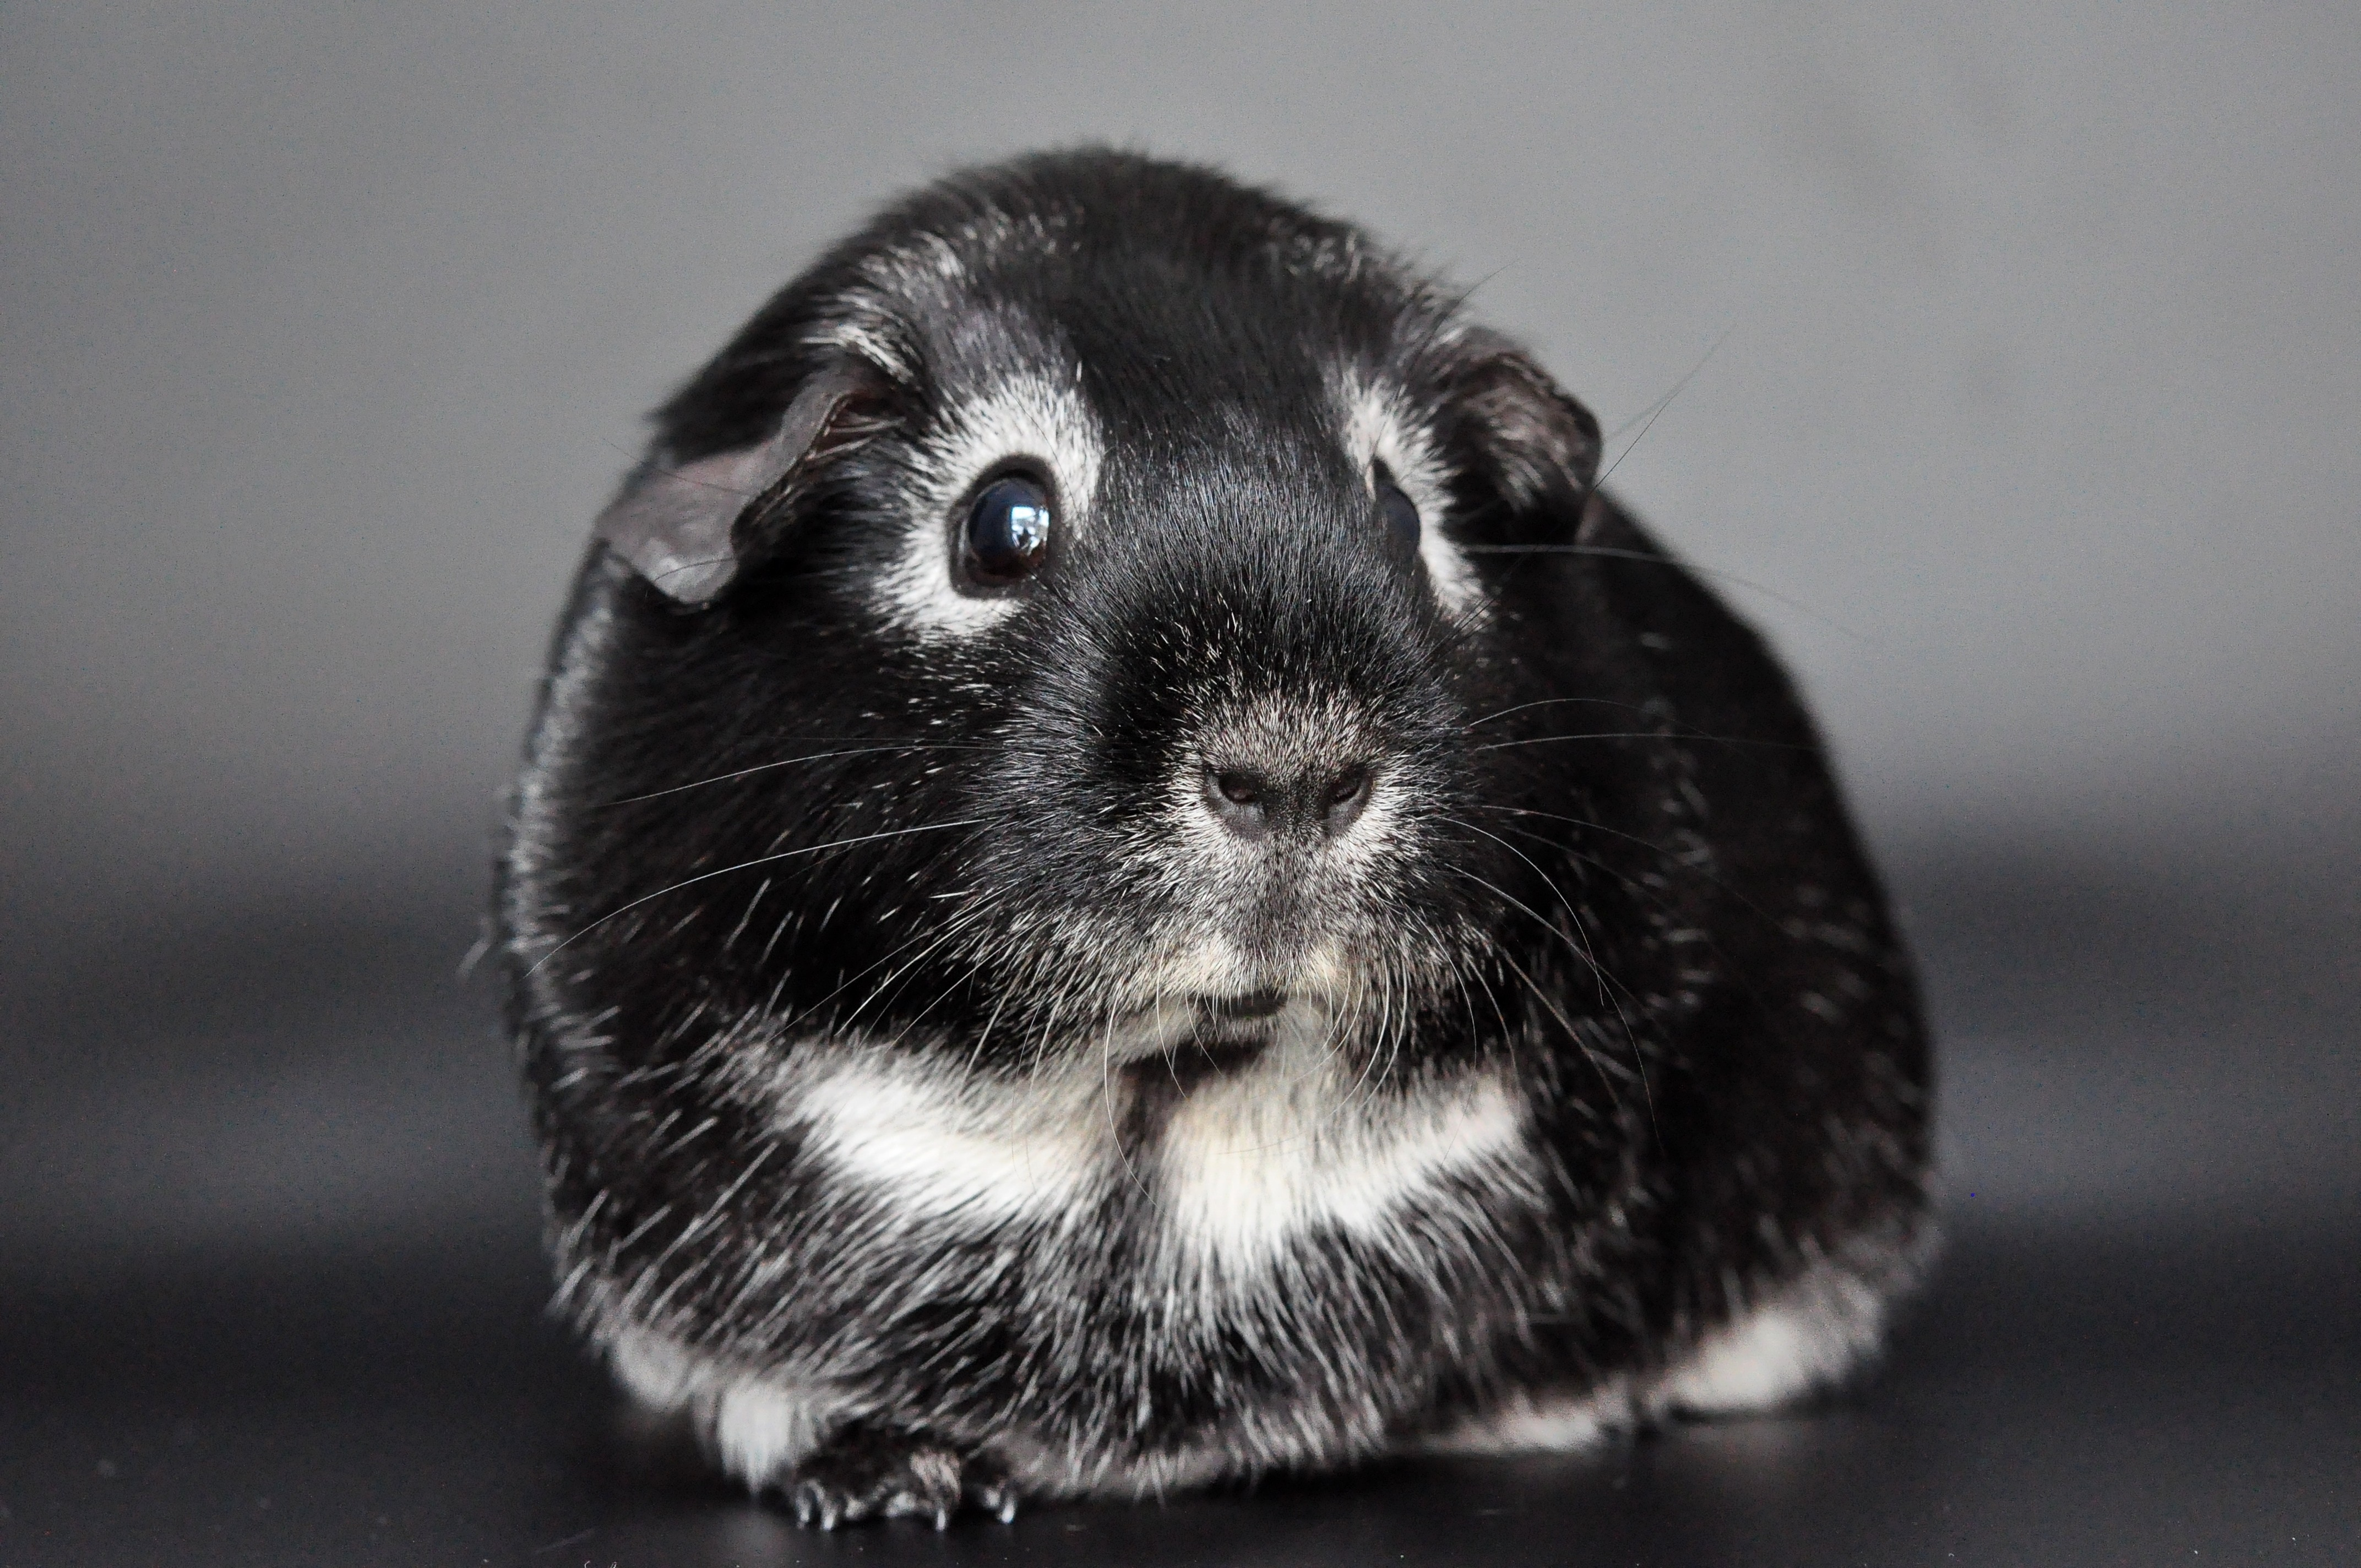 Guinea pig, Animal, Friend, Guinea, Loyal, HQ Photo